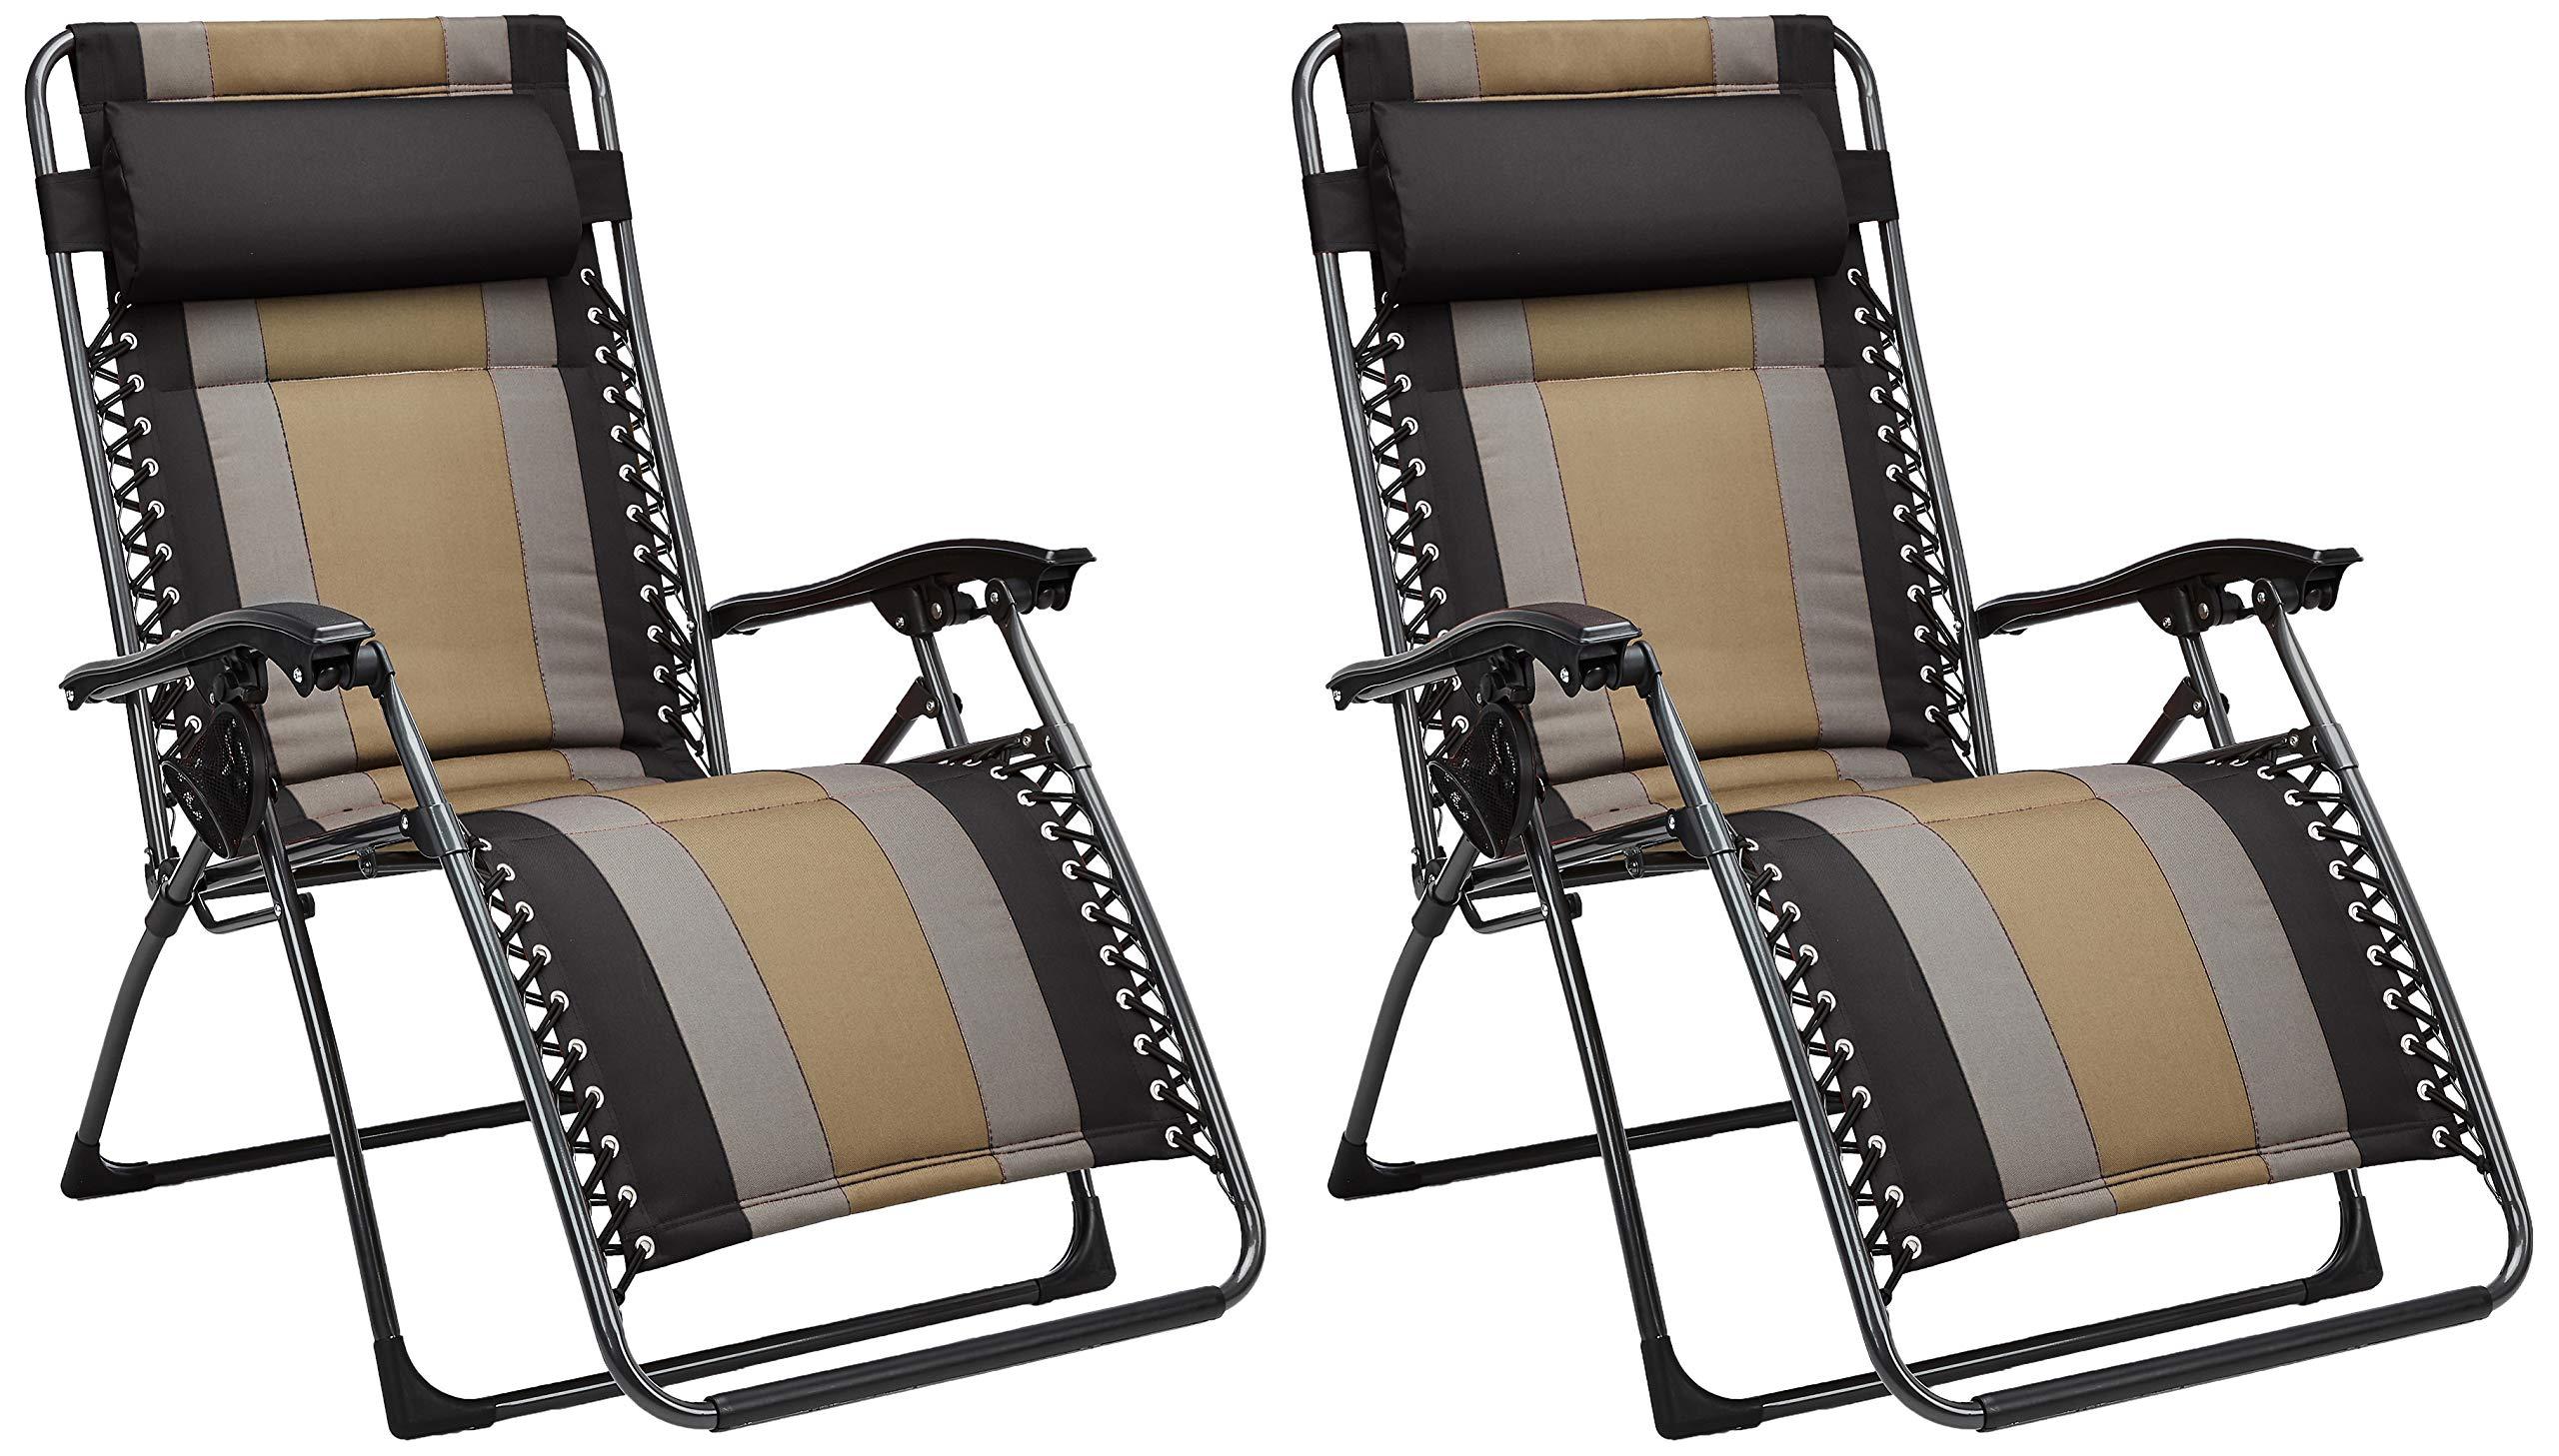 AmazonBasics Padded Gravity Chair Black